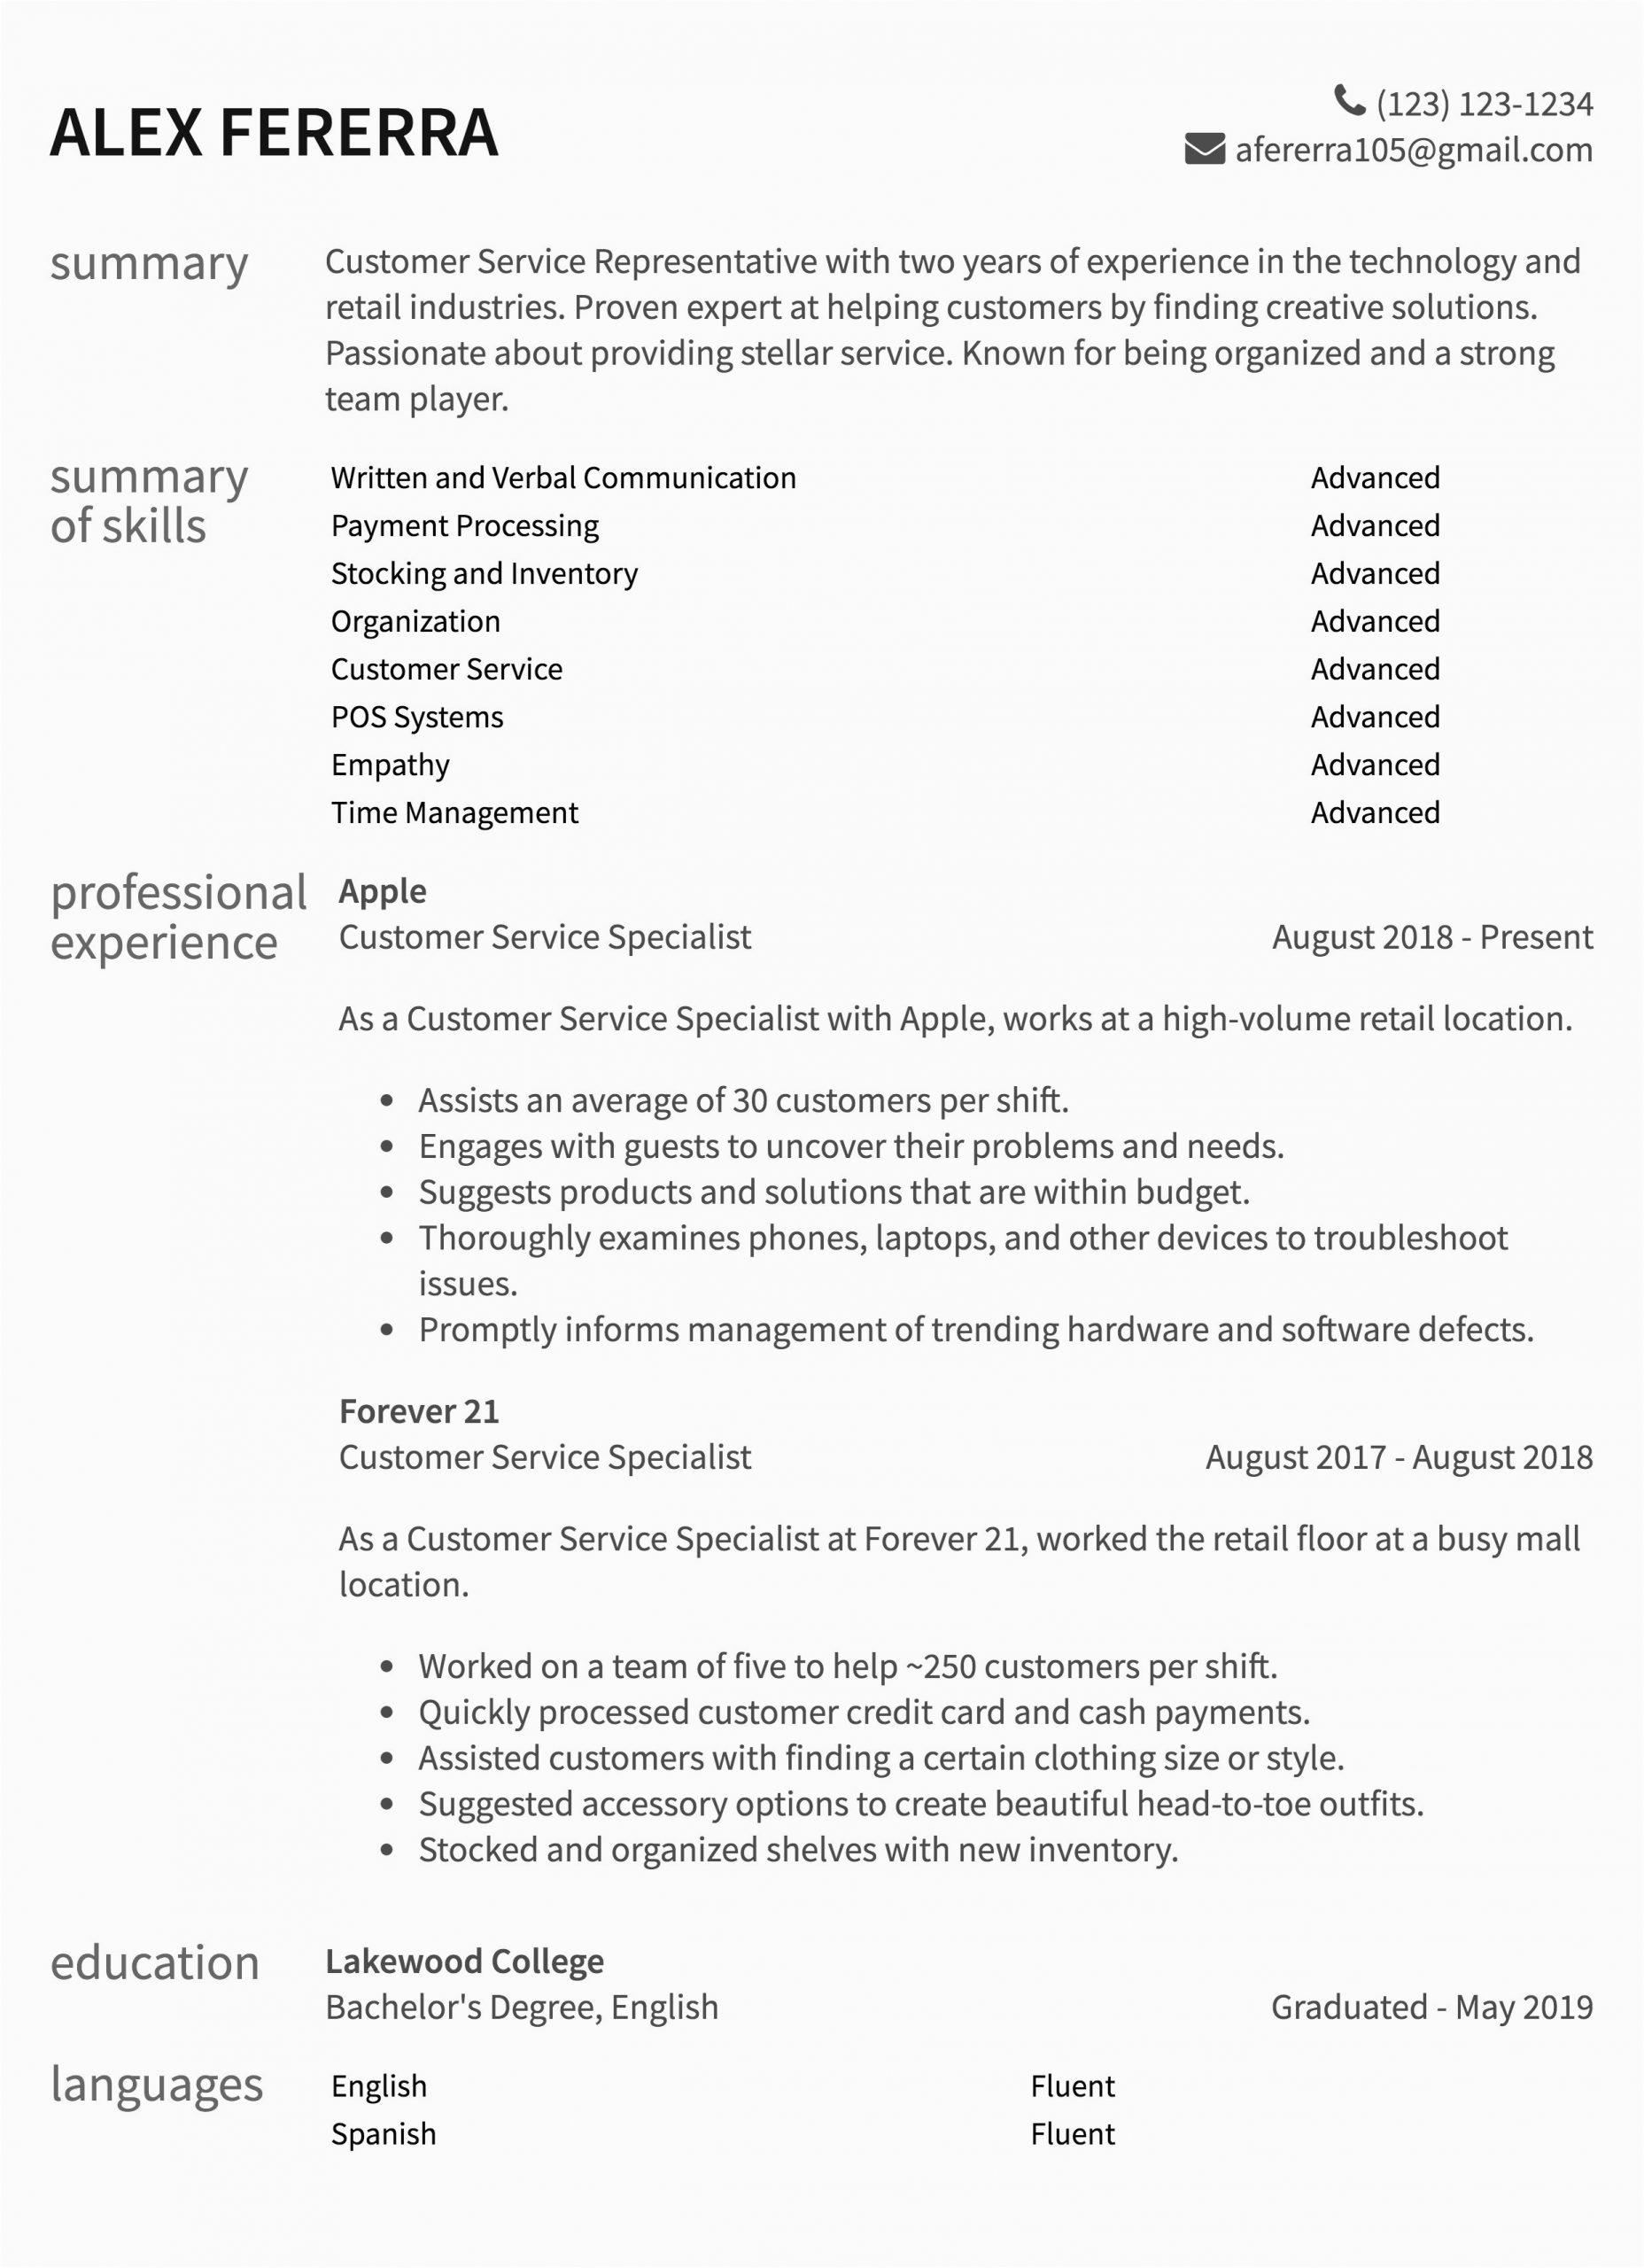 Resume Samples for Customer Service Skills Customer Service Resume Samples & How to Guide